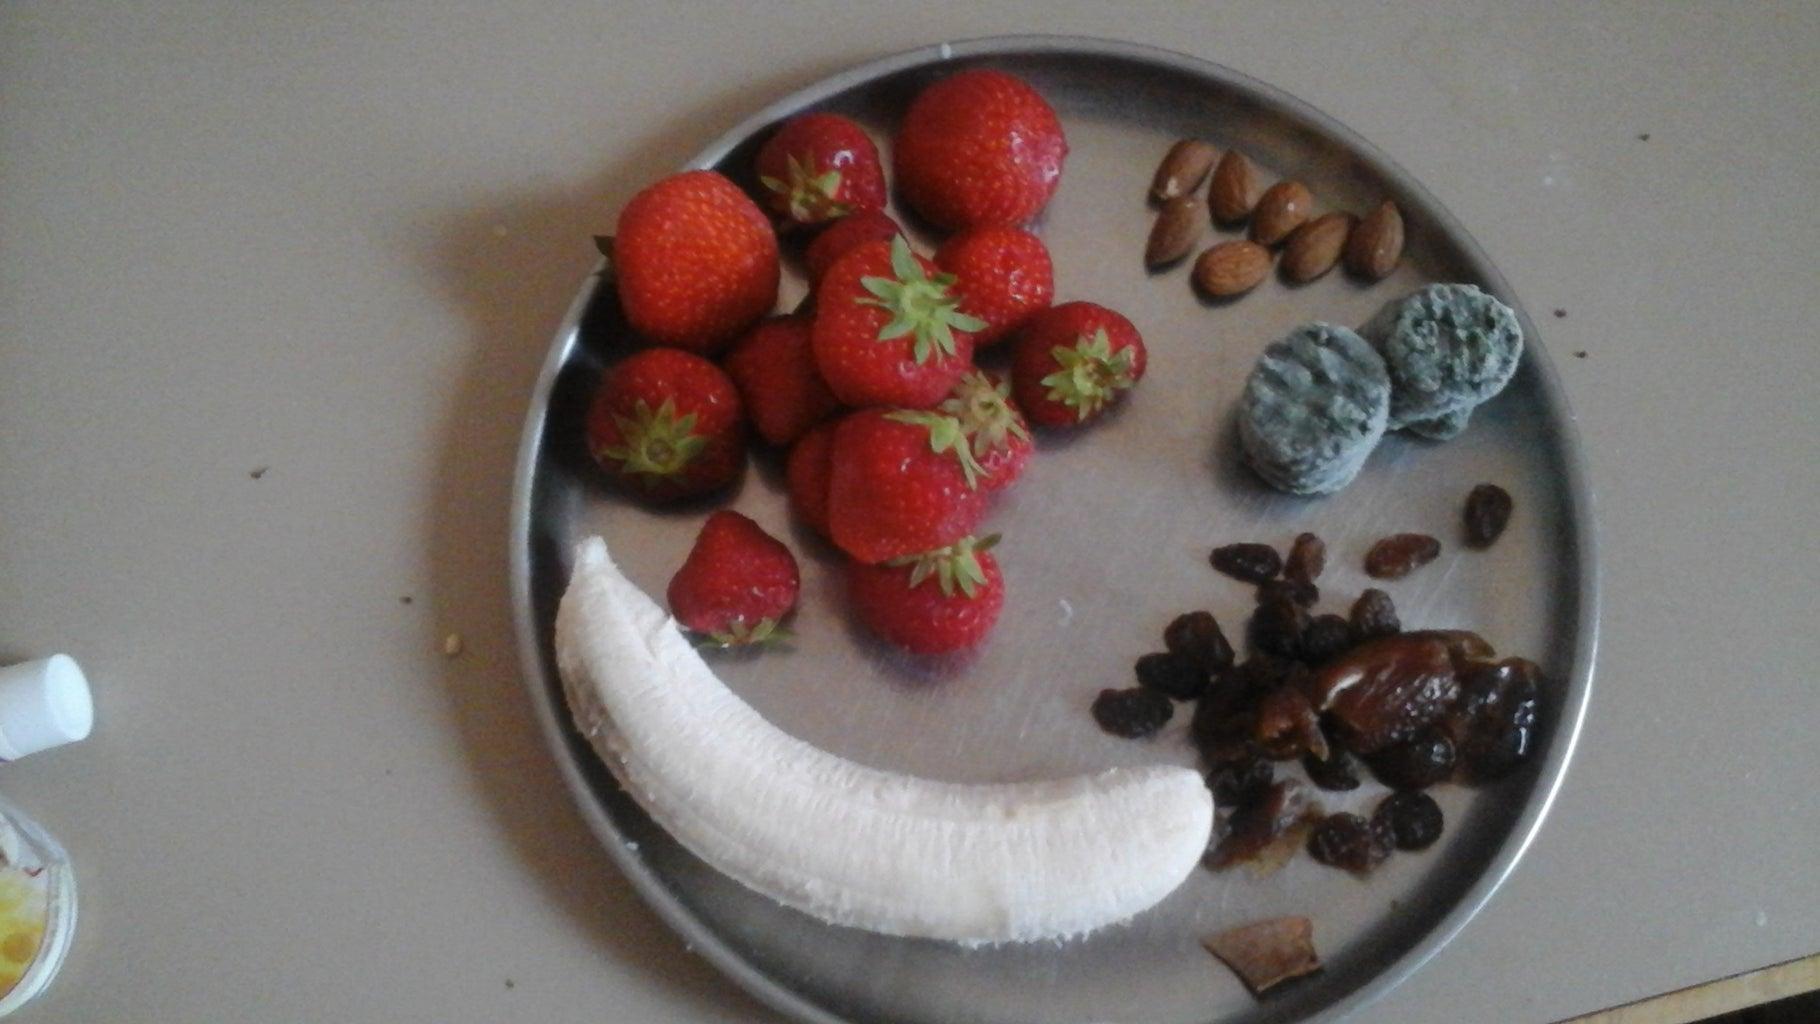 Strawberry Short Cake Green Smoothie: